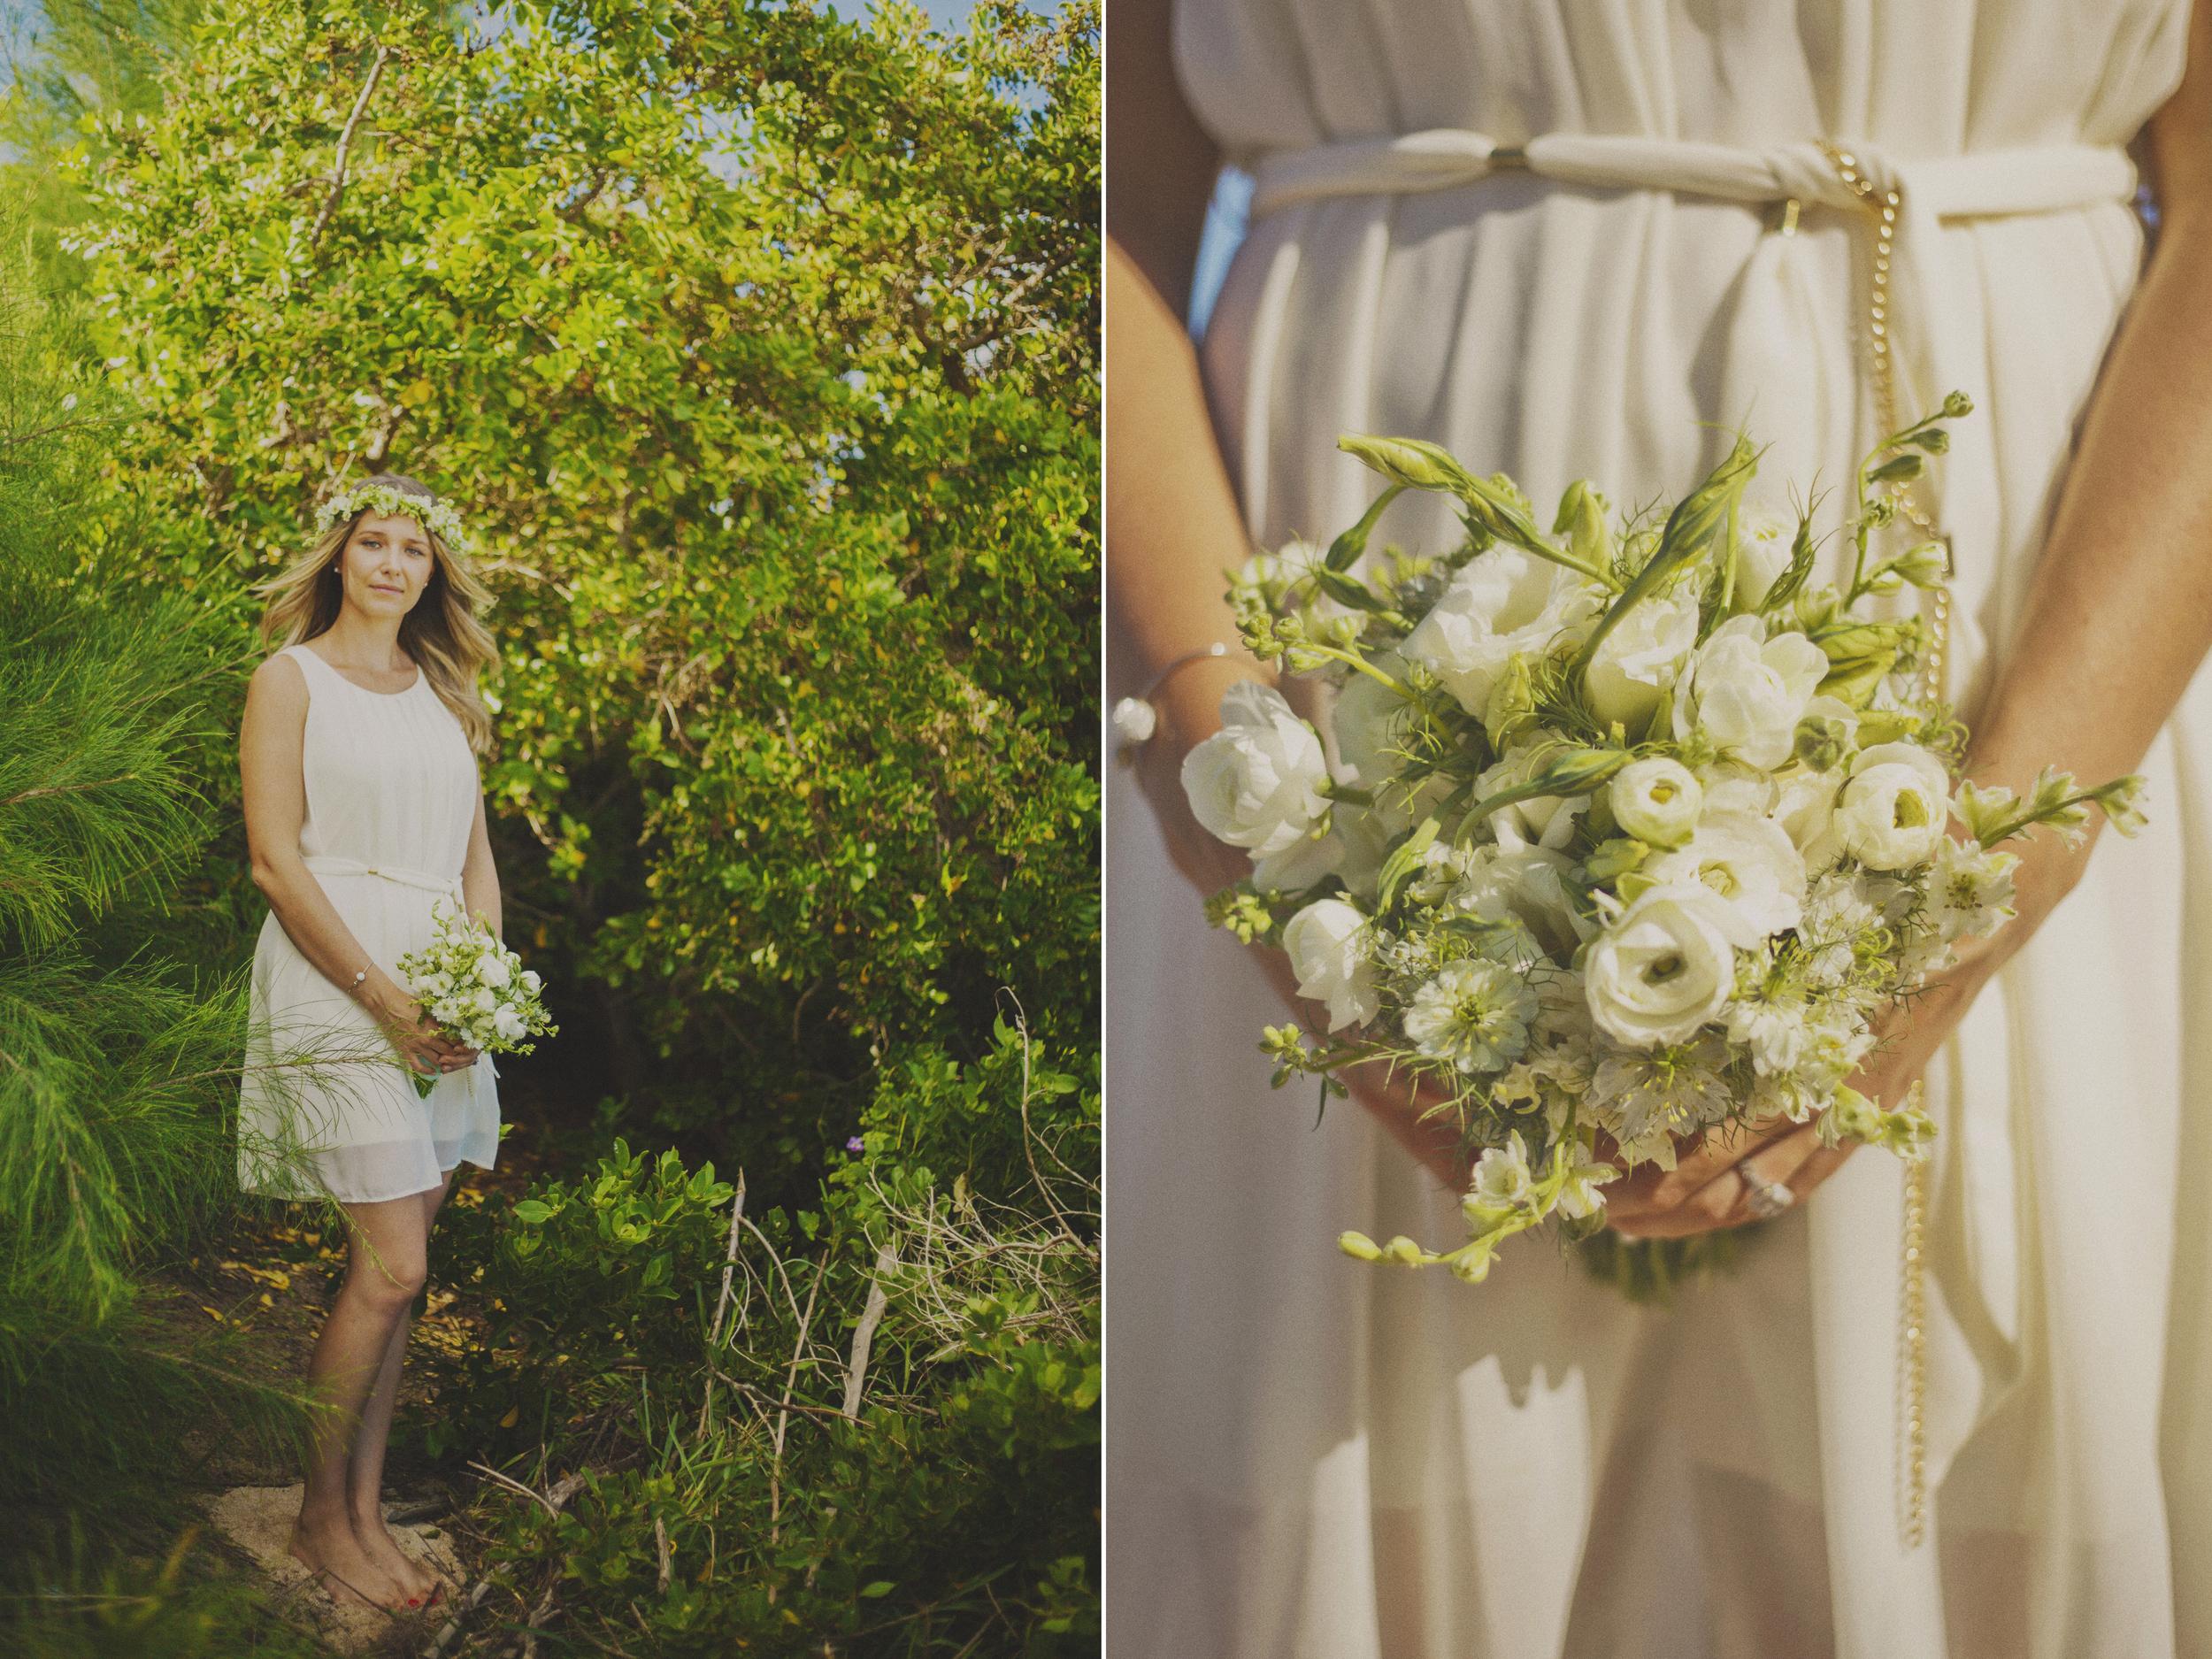 angie-diaz-photography-maui-elopement-oneloa-ironwoods-beach-31.jpg